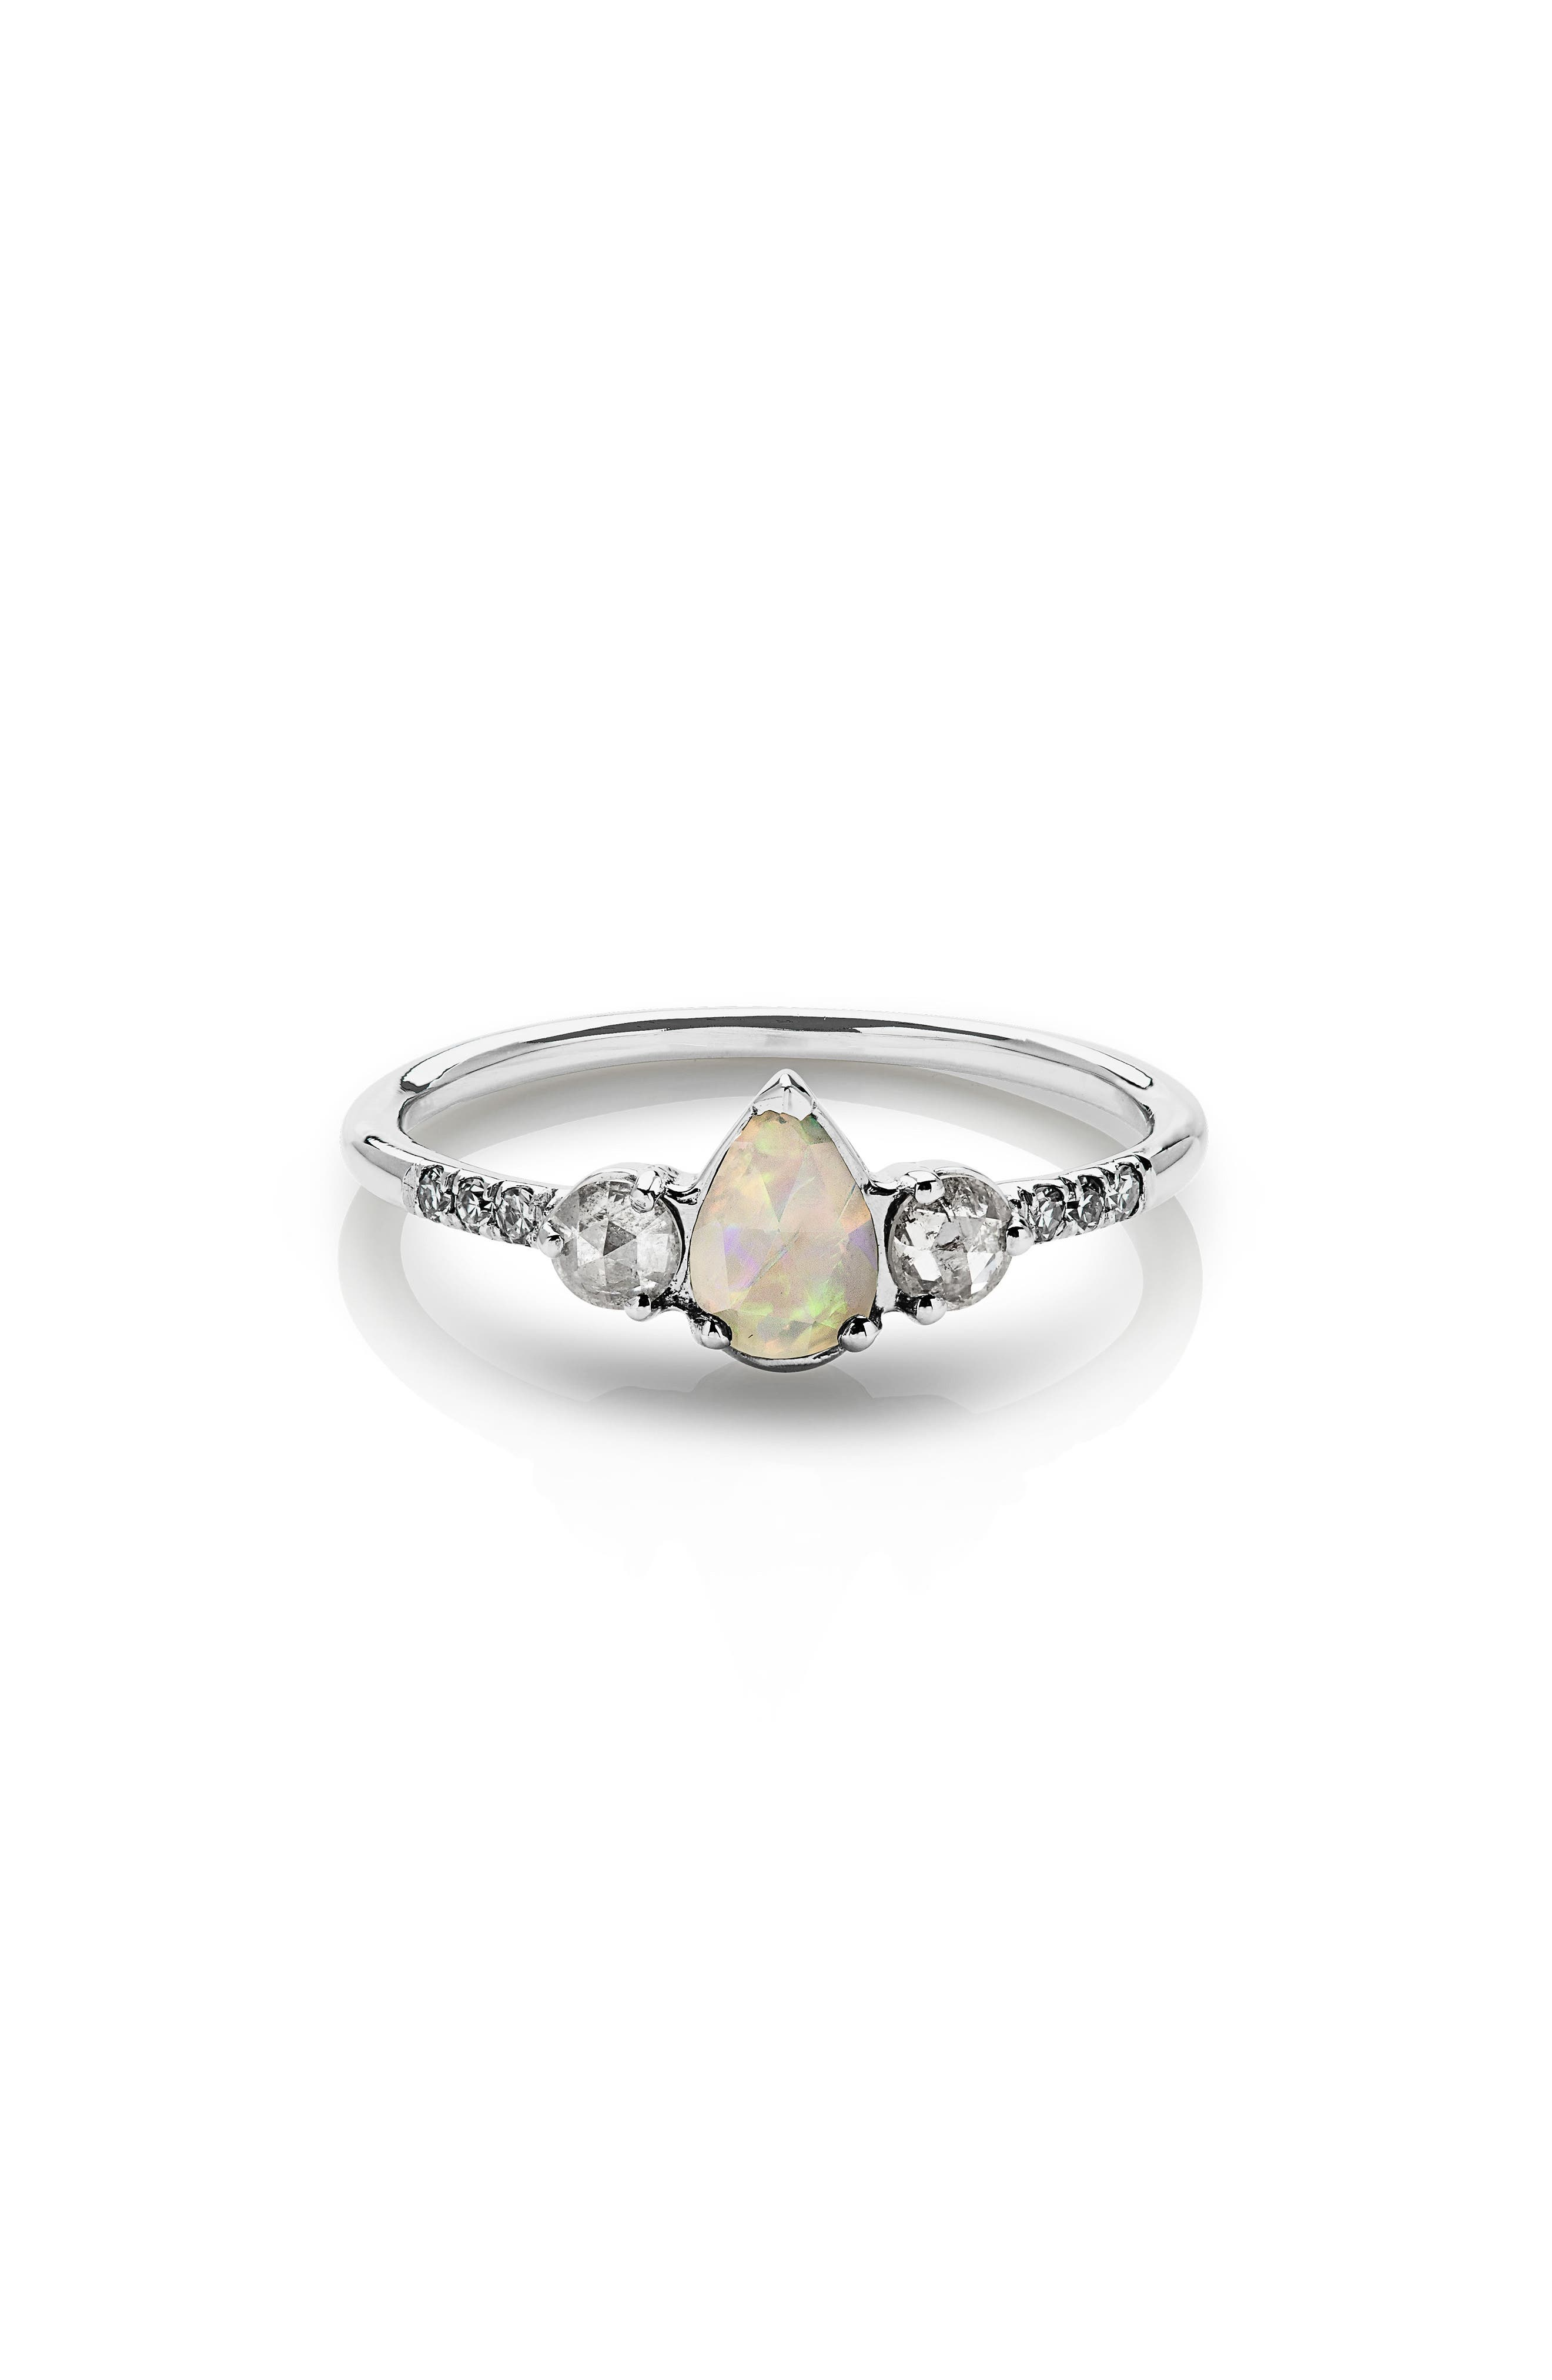 Main Image - MANIAMANIA Radiance Opal & Diamond Ring